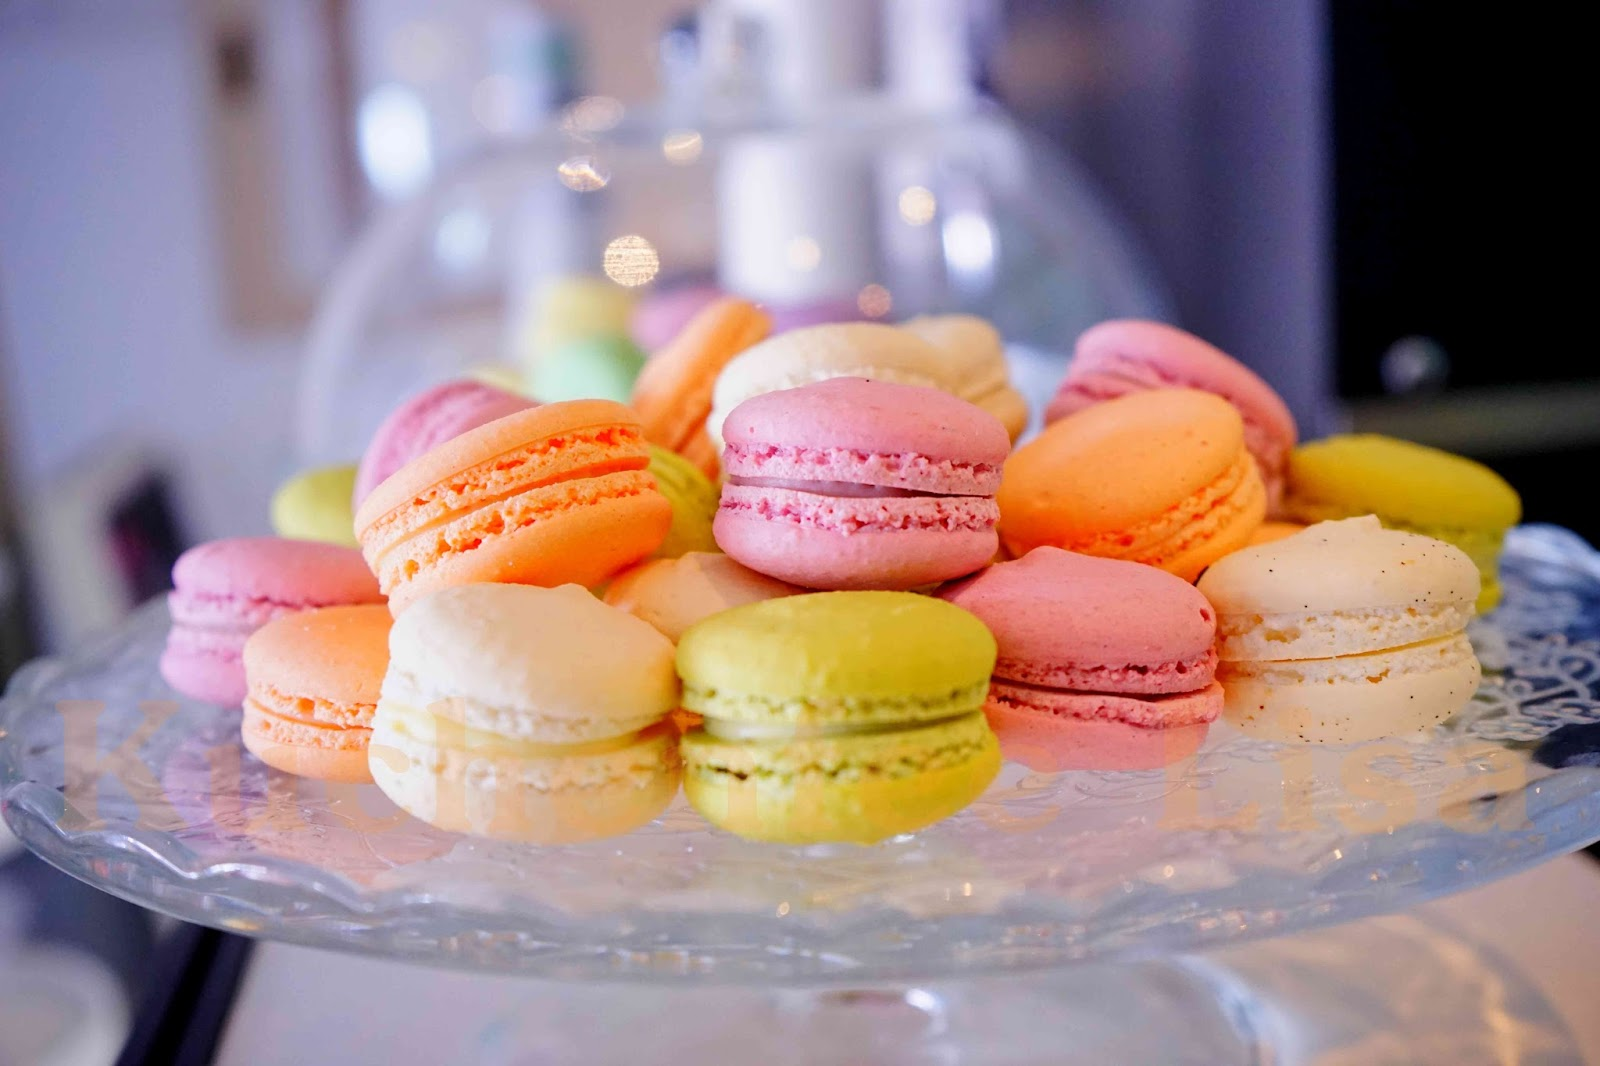 macarons franz sische methode rezept kuchenfee lisa. Black Bedroom Furniture Sets. Home Design Ideas